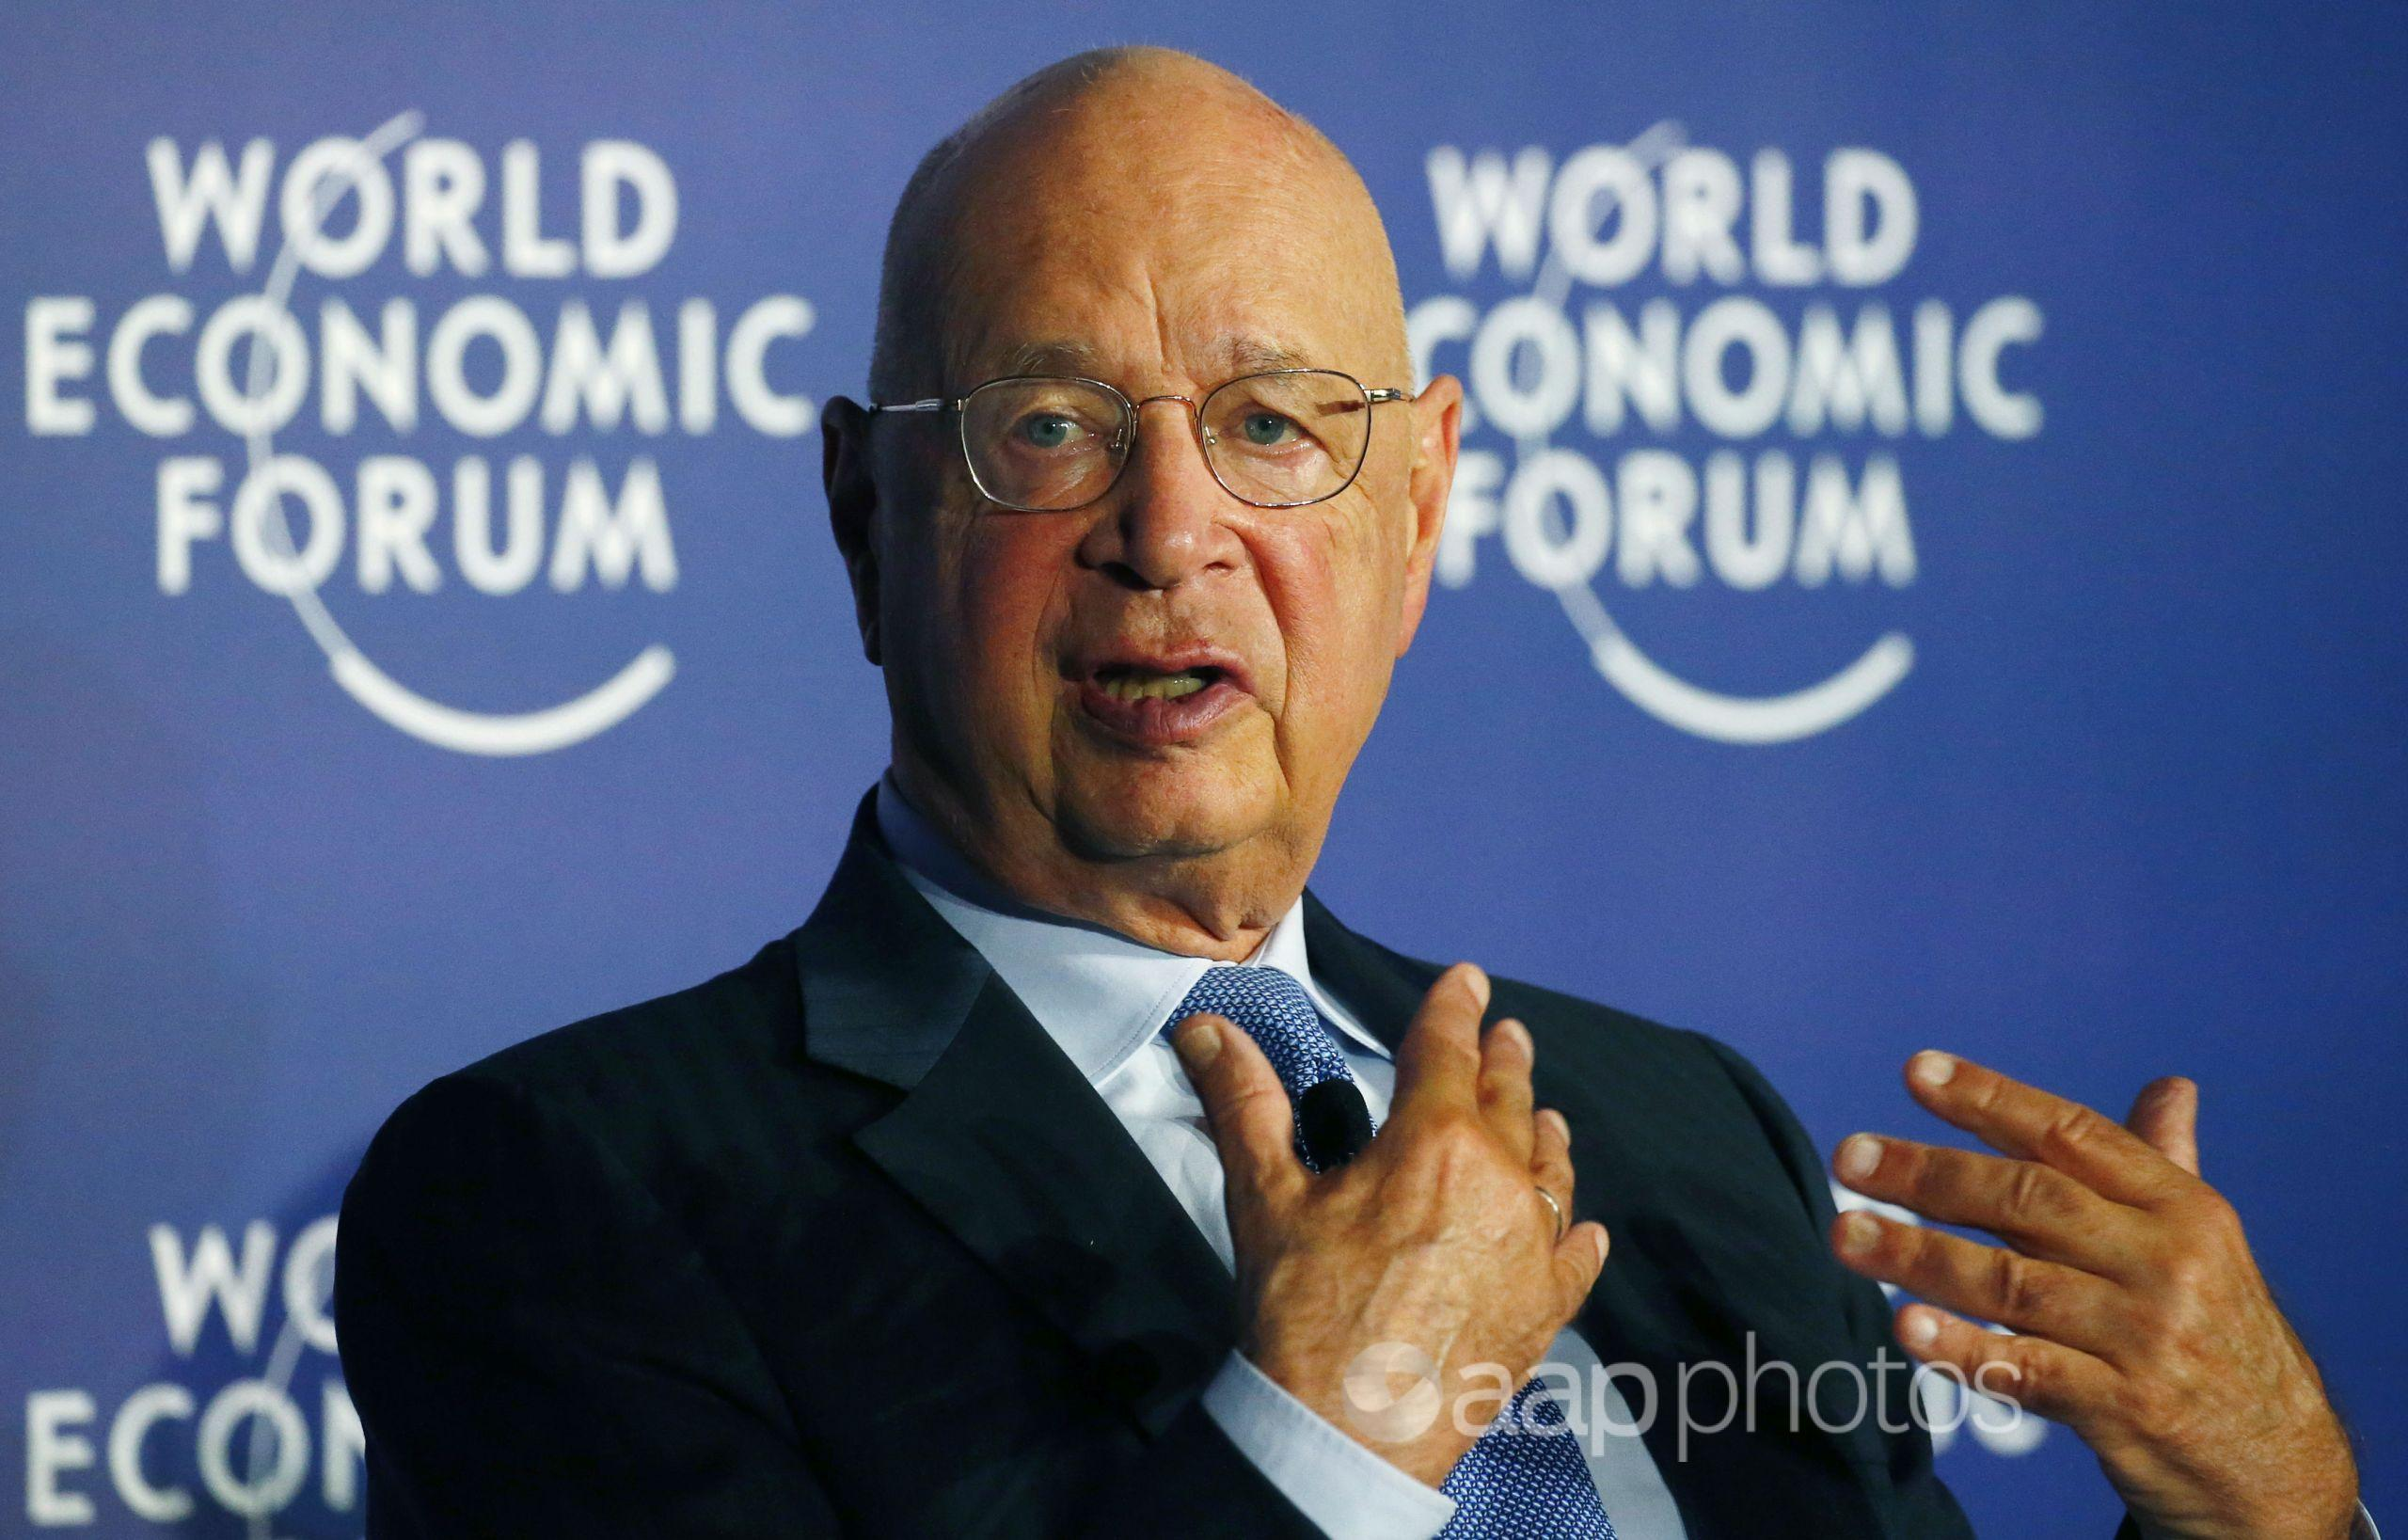 Klaus Schwab, executive chairman of the World Economic Forum